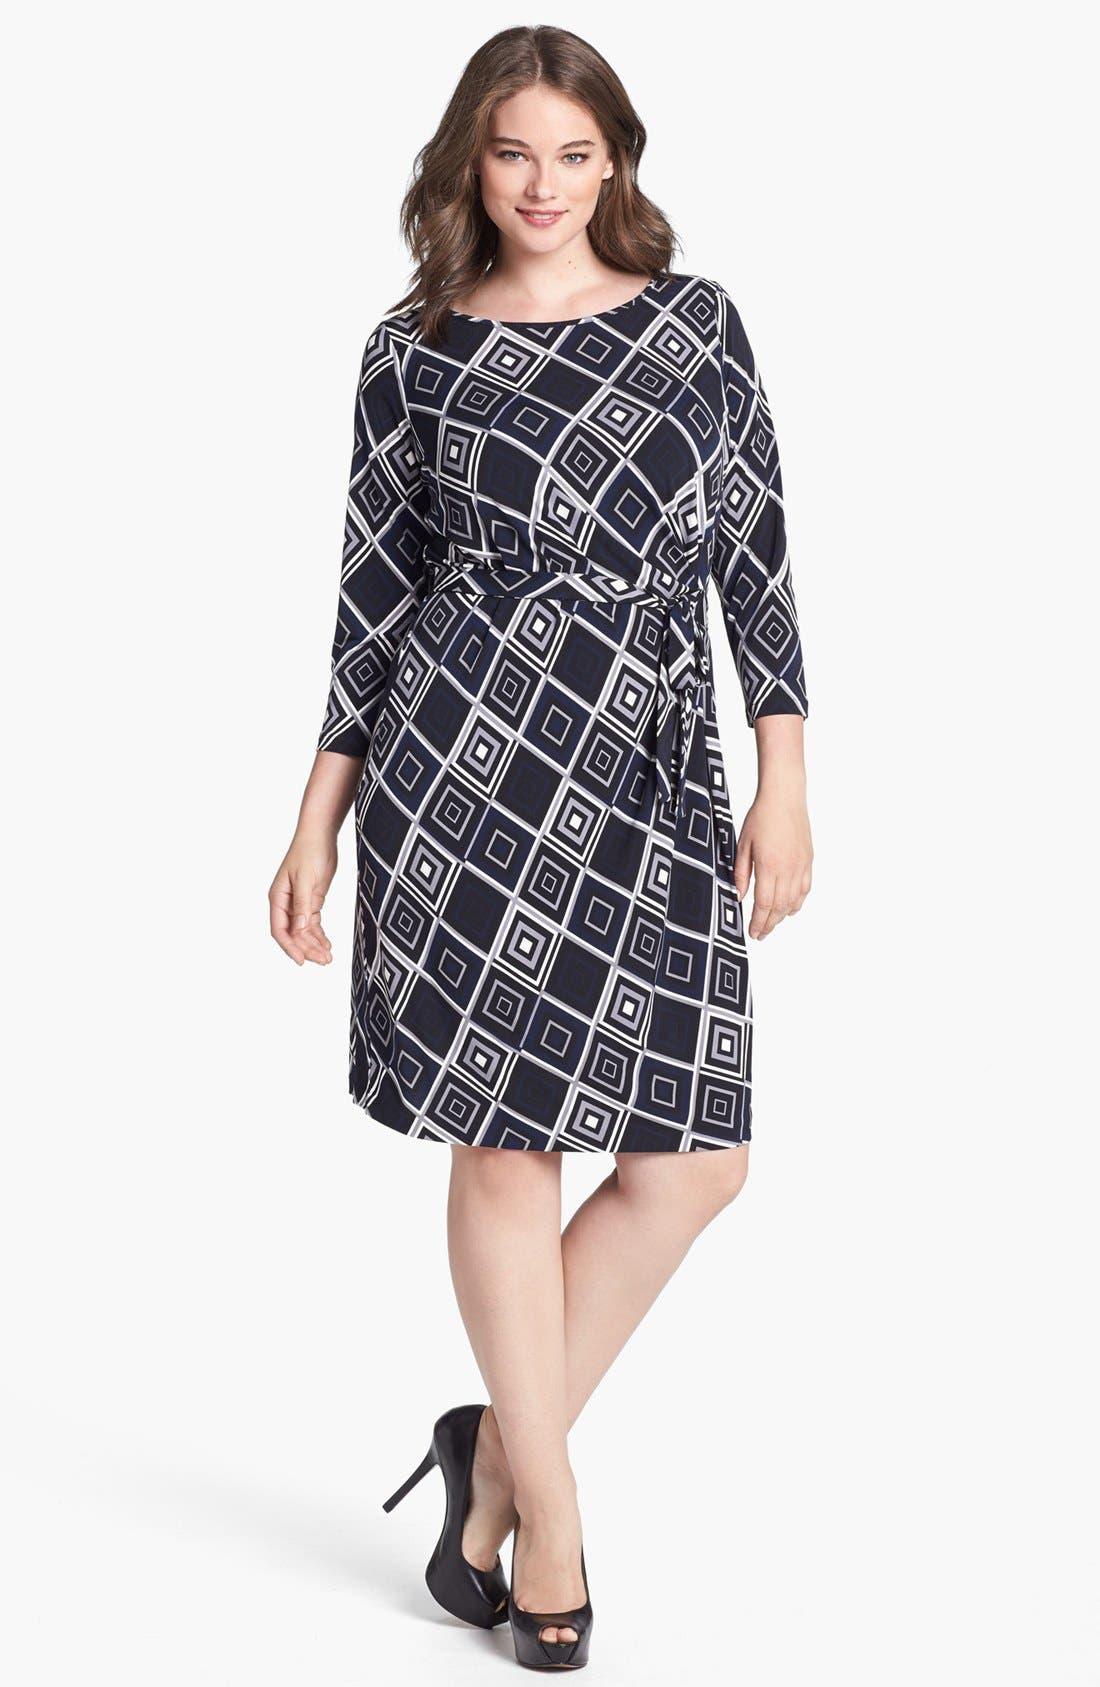 Alternate Image 1 Selected - Anne Klein Print Faux Wrap Jersey Dress (Plus Size)